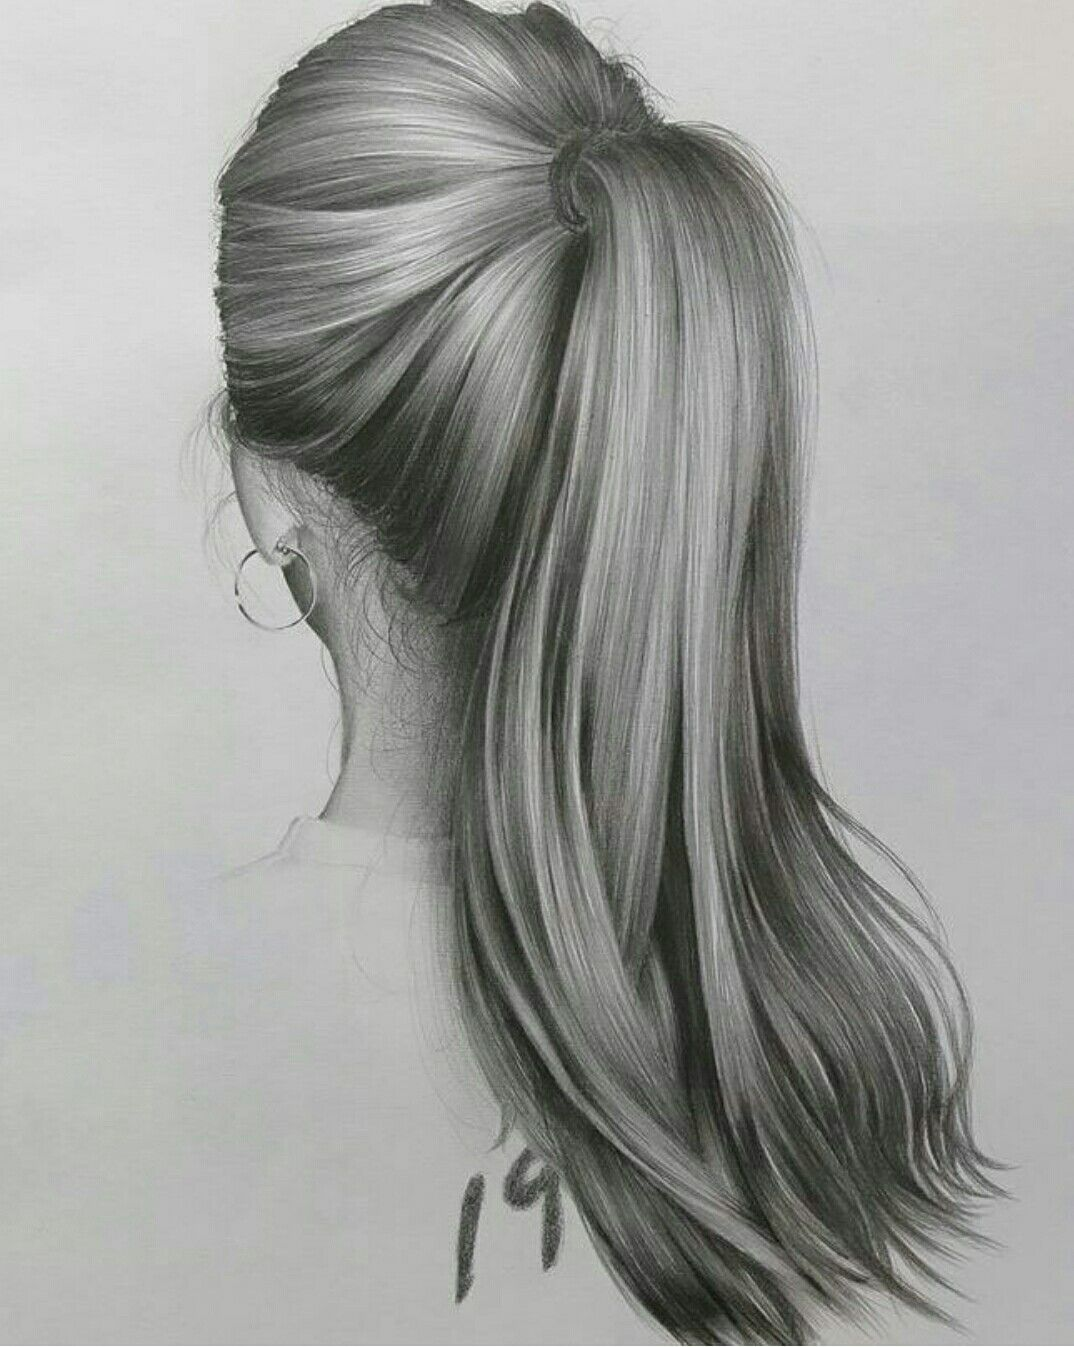 Sketch realistic sketch sketch drawing hair sketch art sketches painting